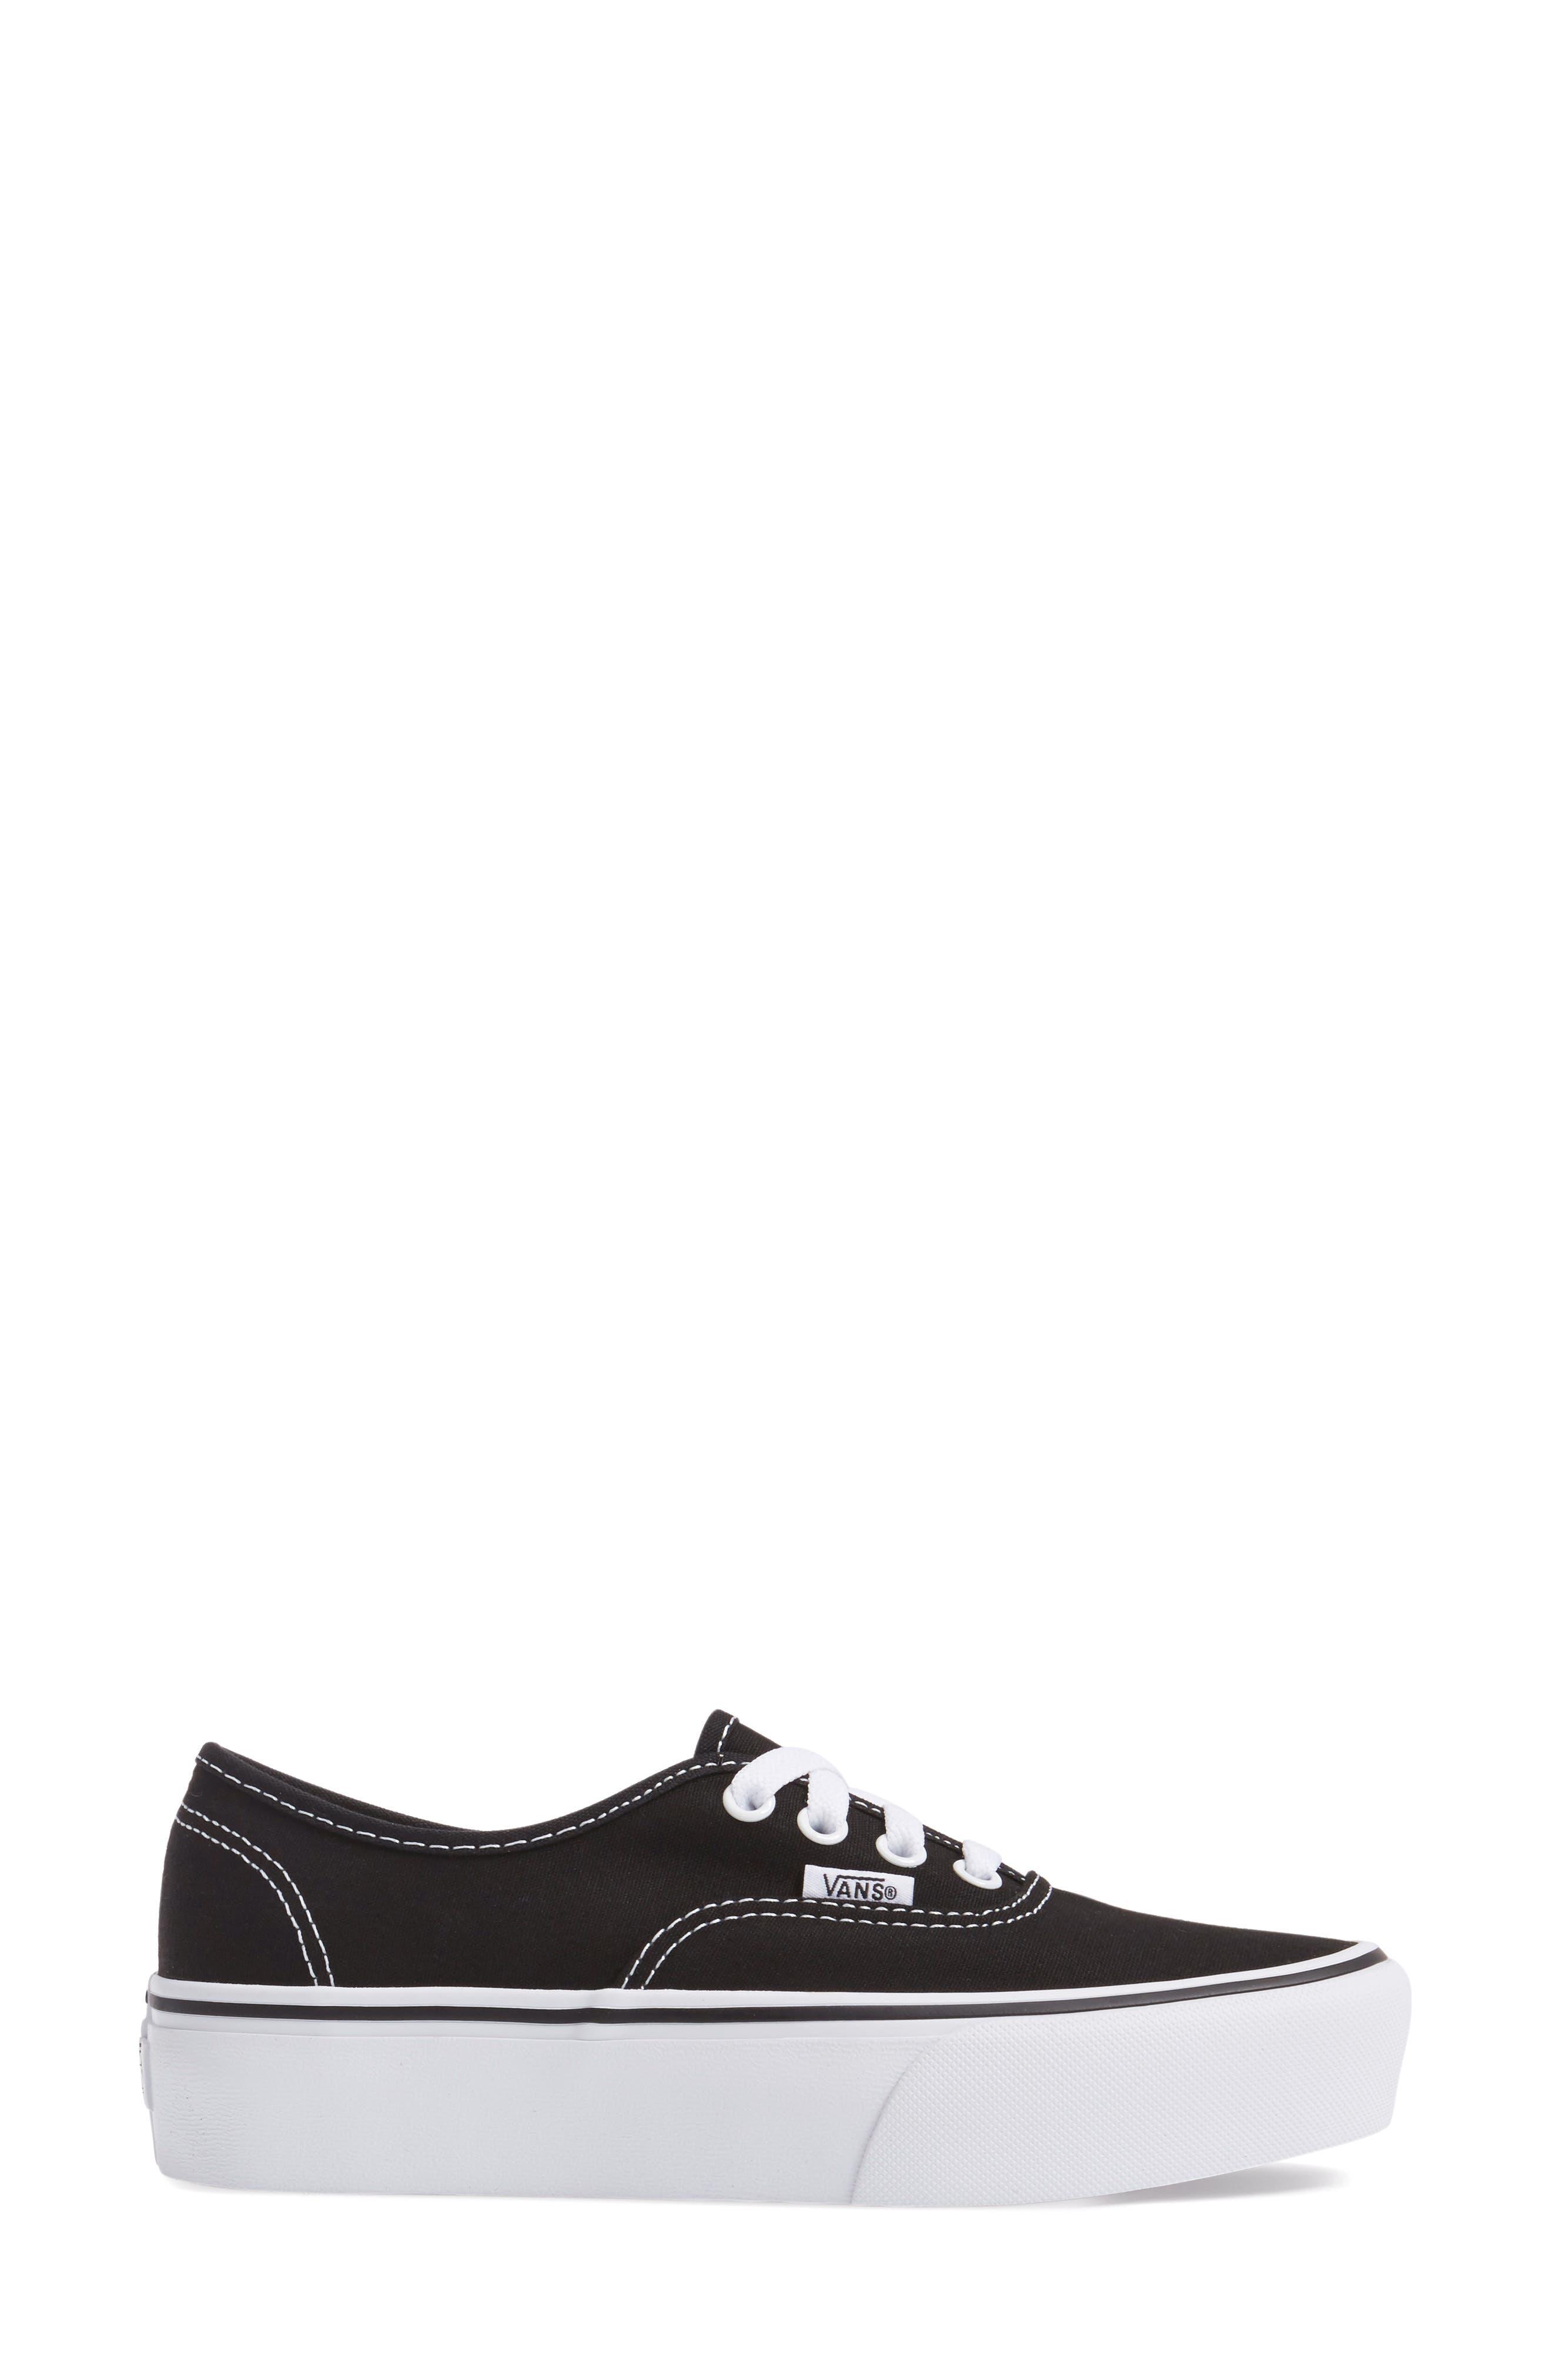 Alternate Image 3  - Vans 'Authentic' Platform Sneaker (Women)